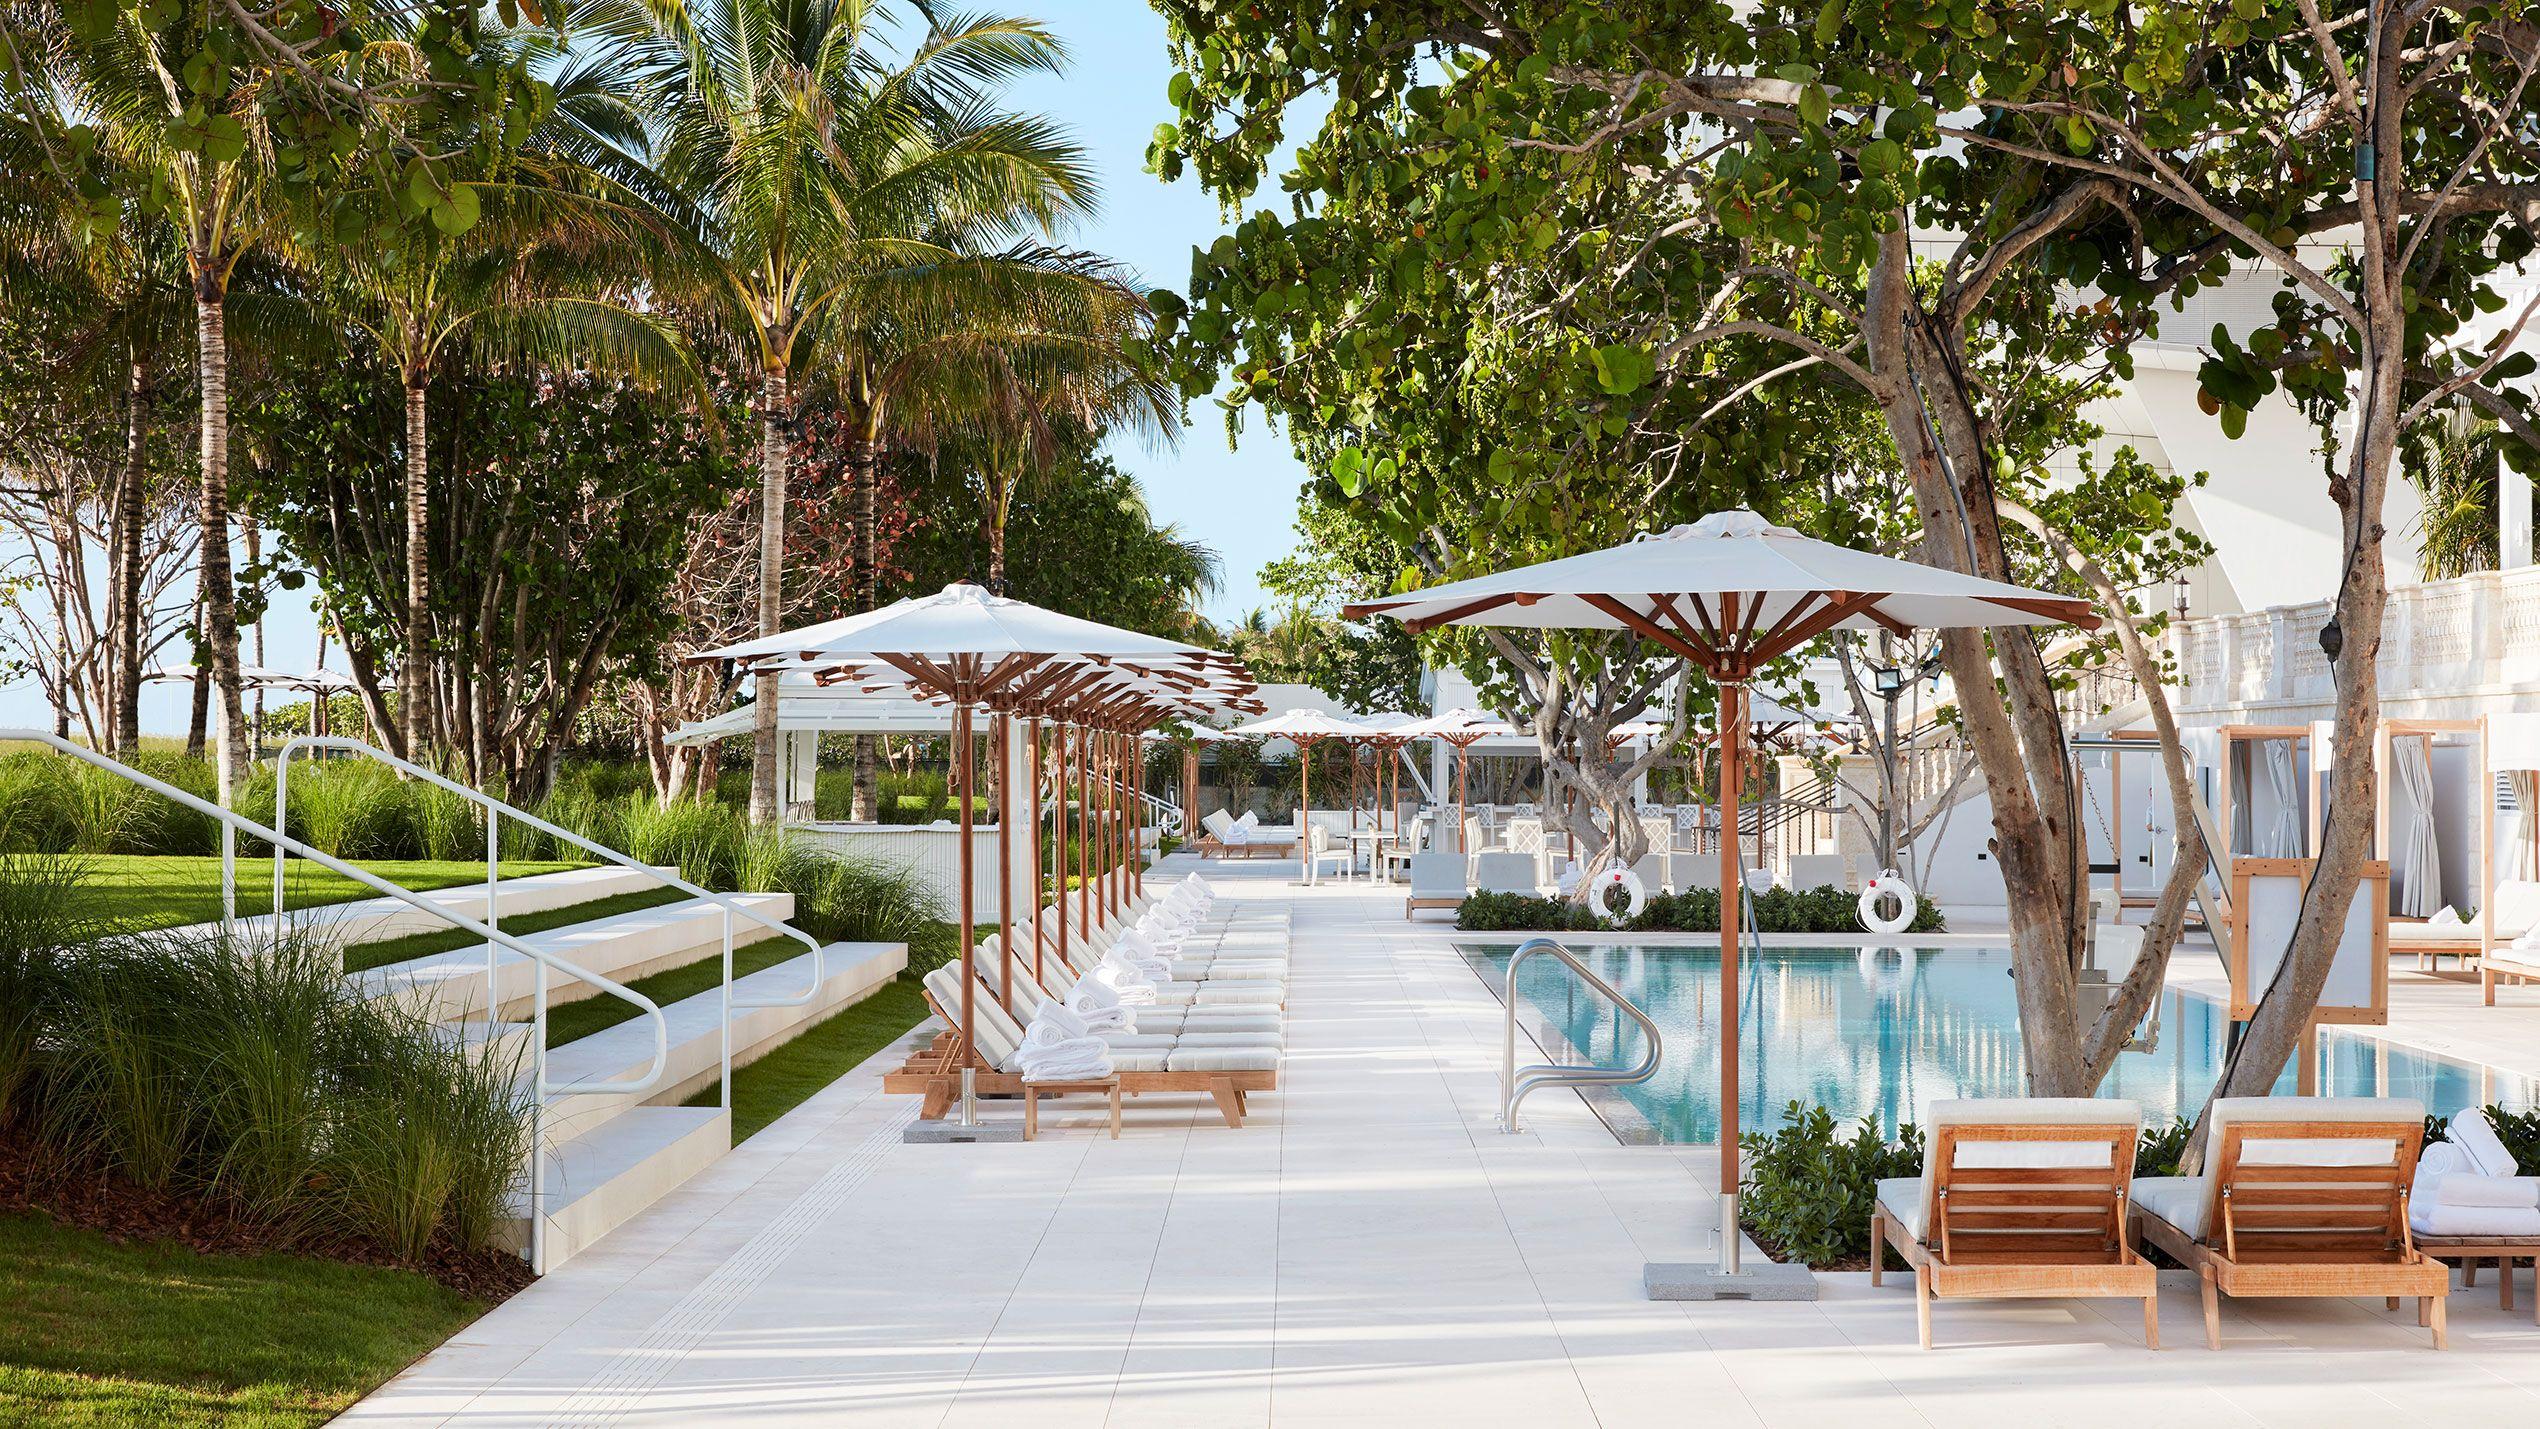 Four Seasons Surf Club | Outdoor living design, Luxury ... on 4 Seasons Outdoor Living id=52885